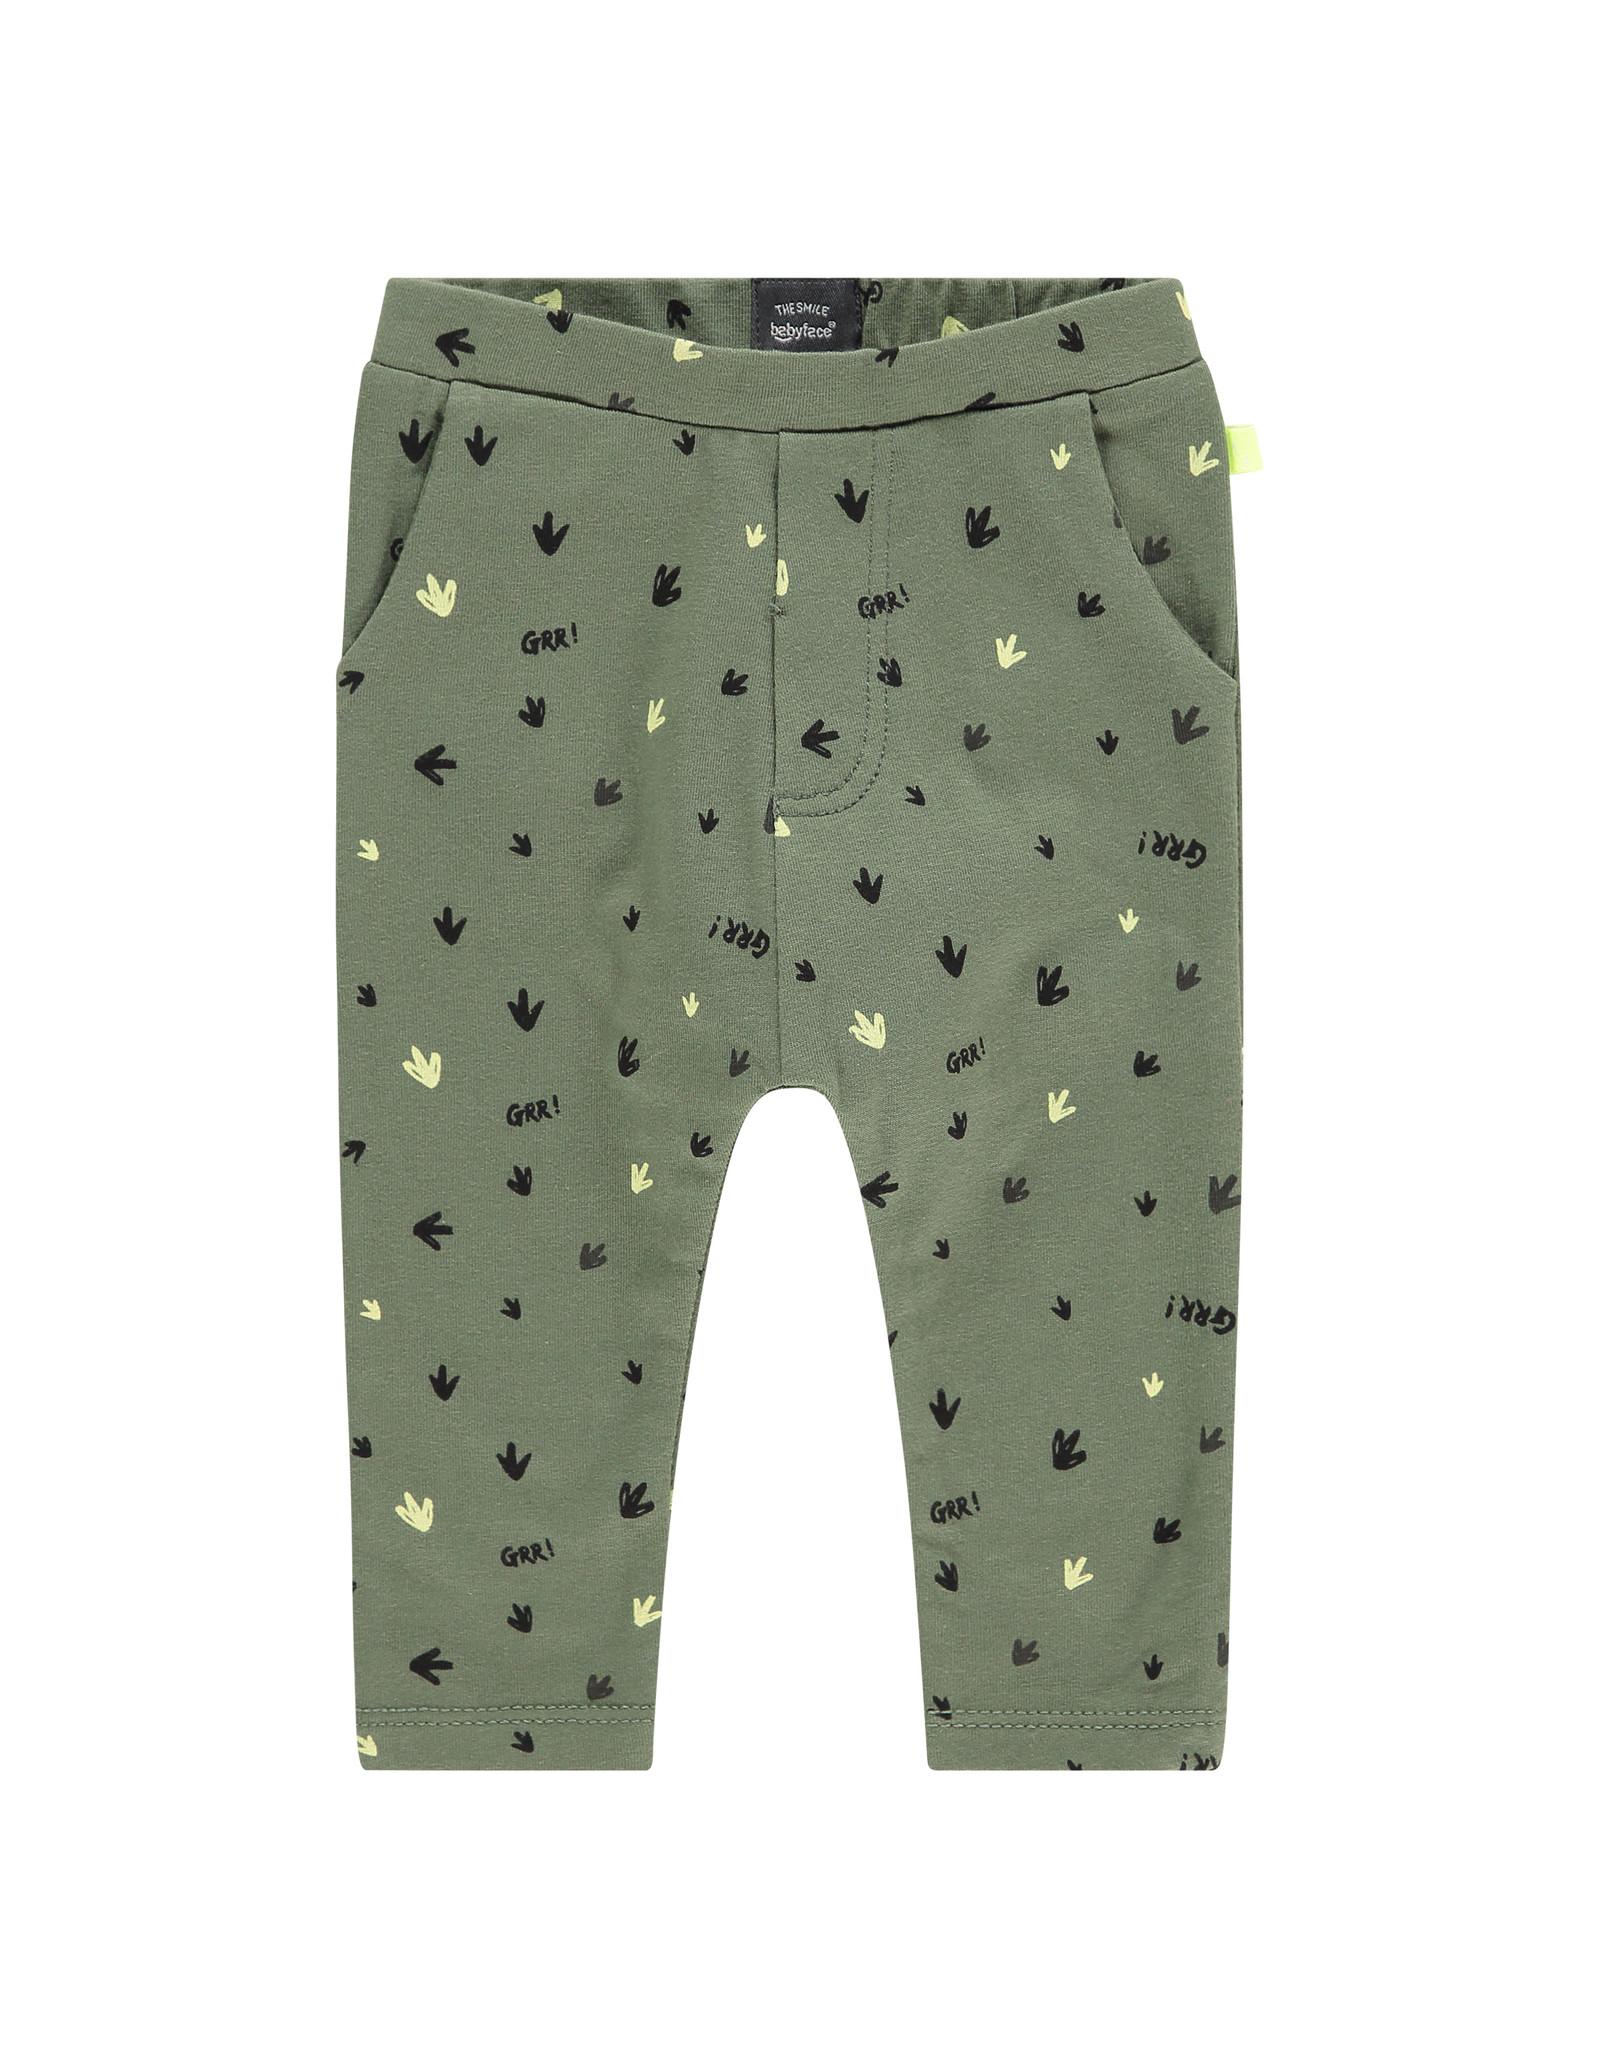 Babyface baby boys pants, army